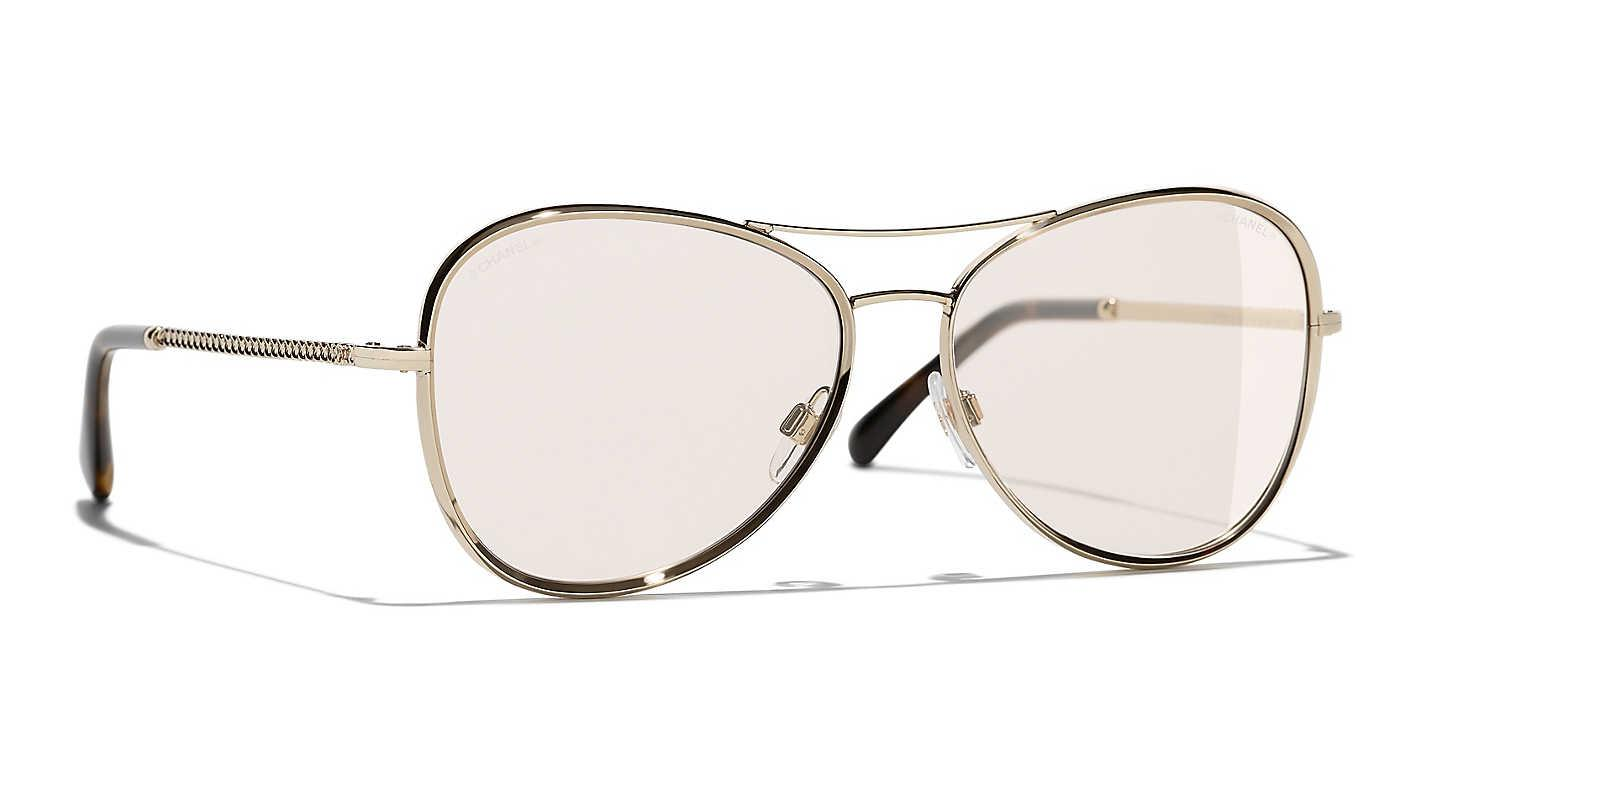 c70fd153b1ca Chanel Sunglass Pilot Sunglasses in Brown - Lyst